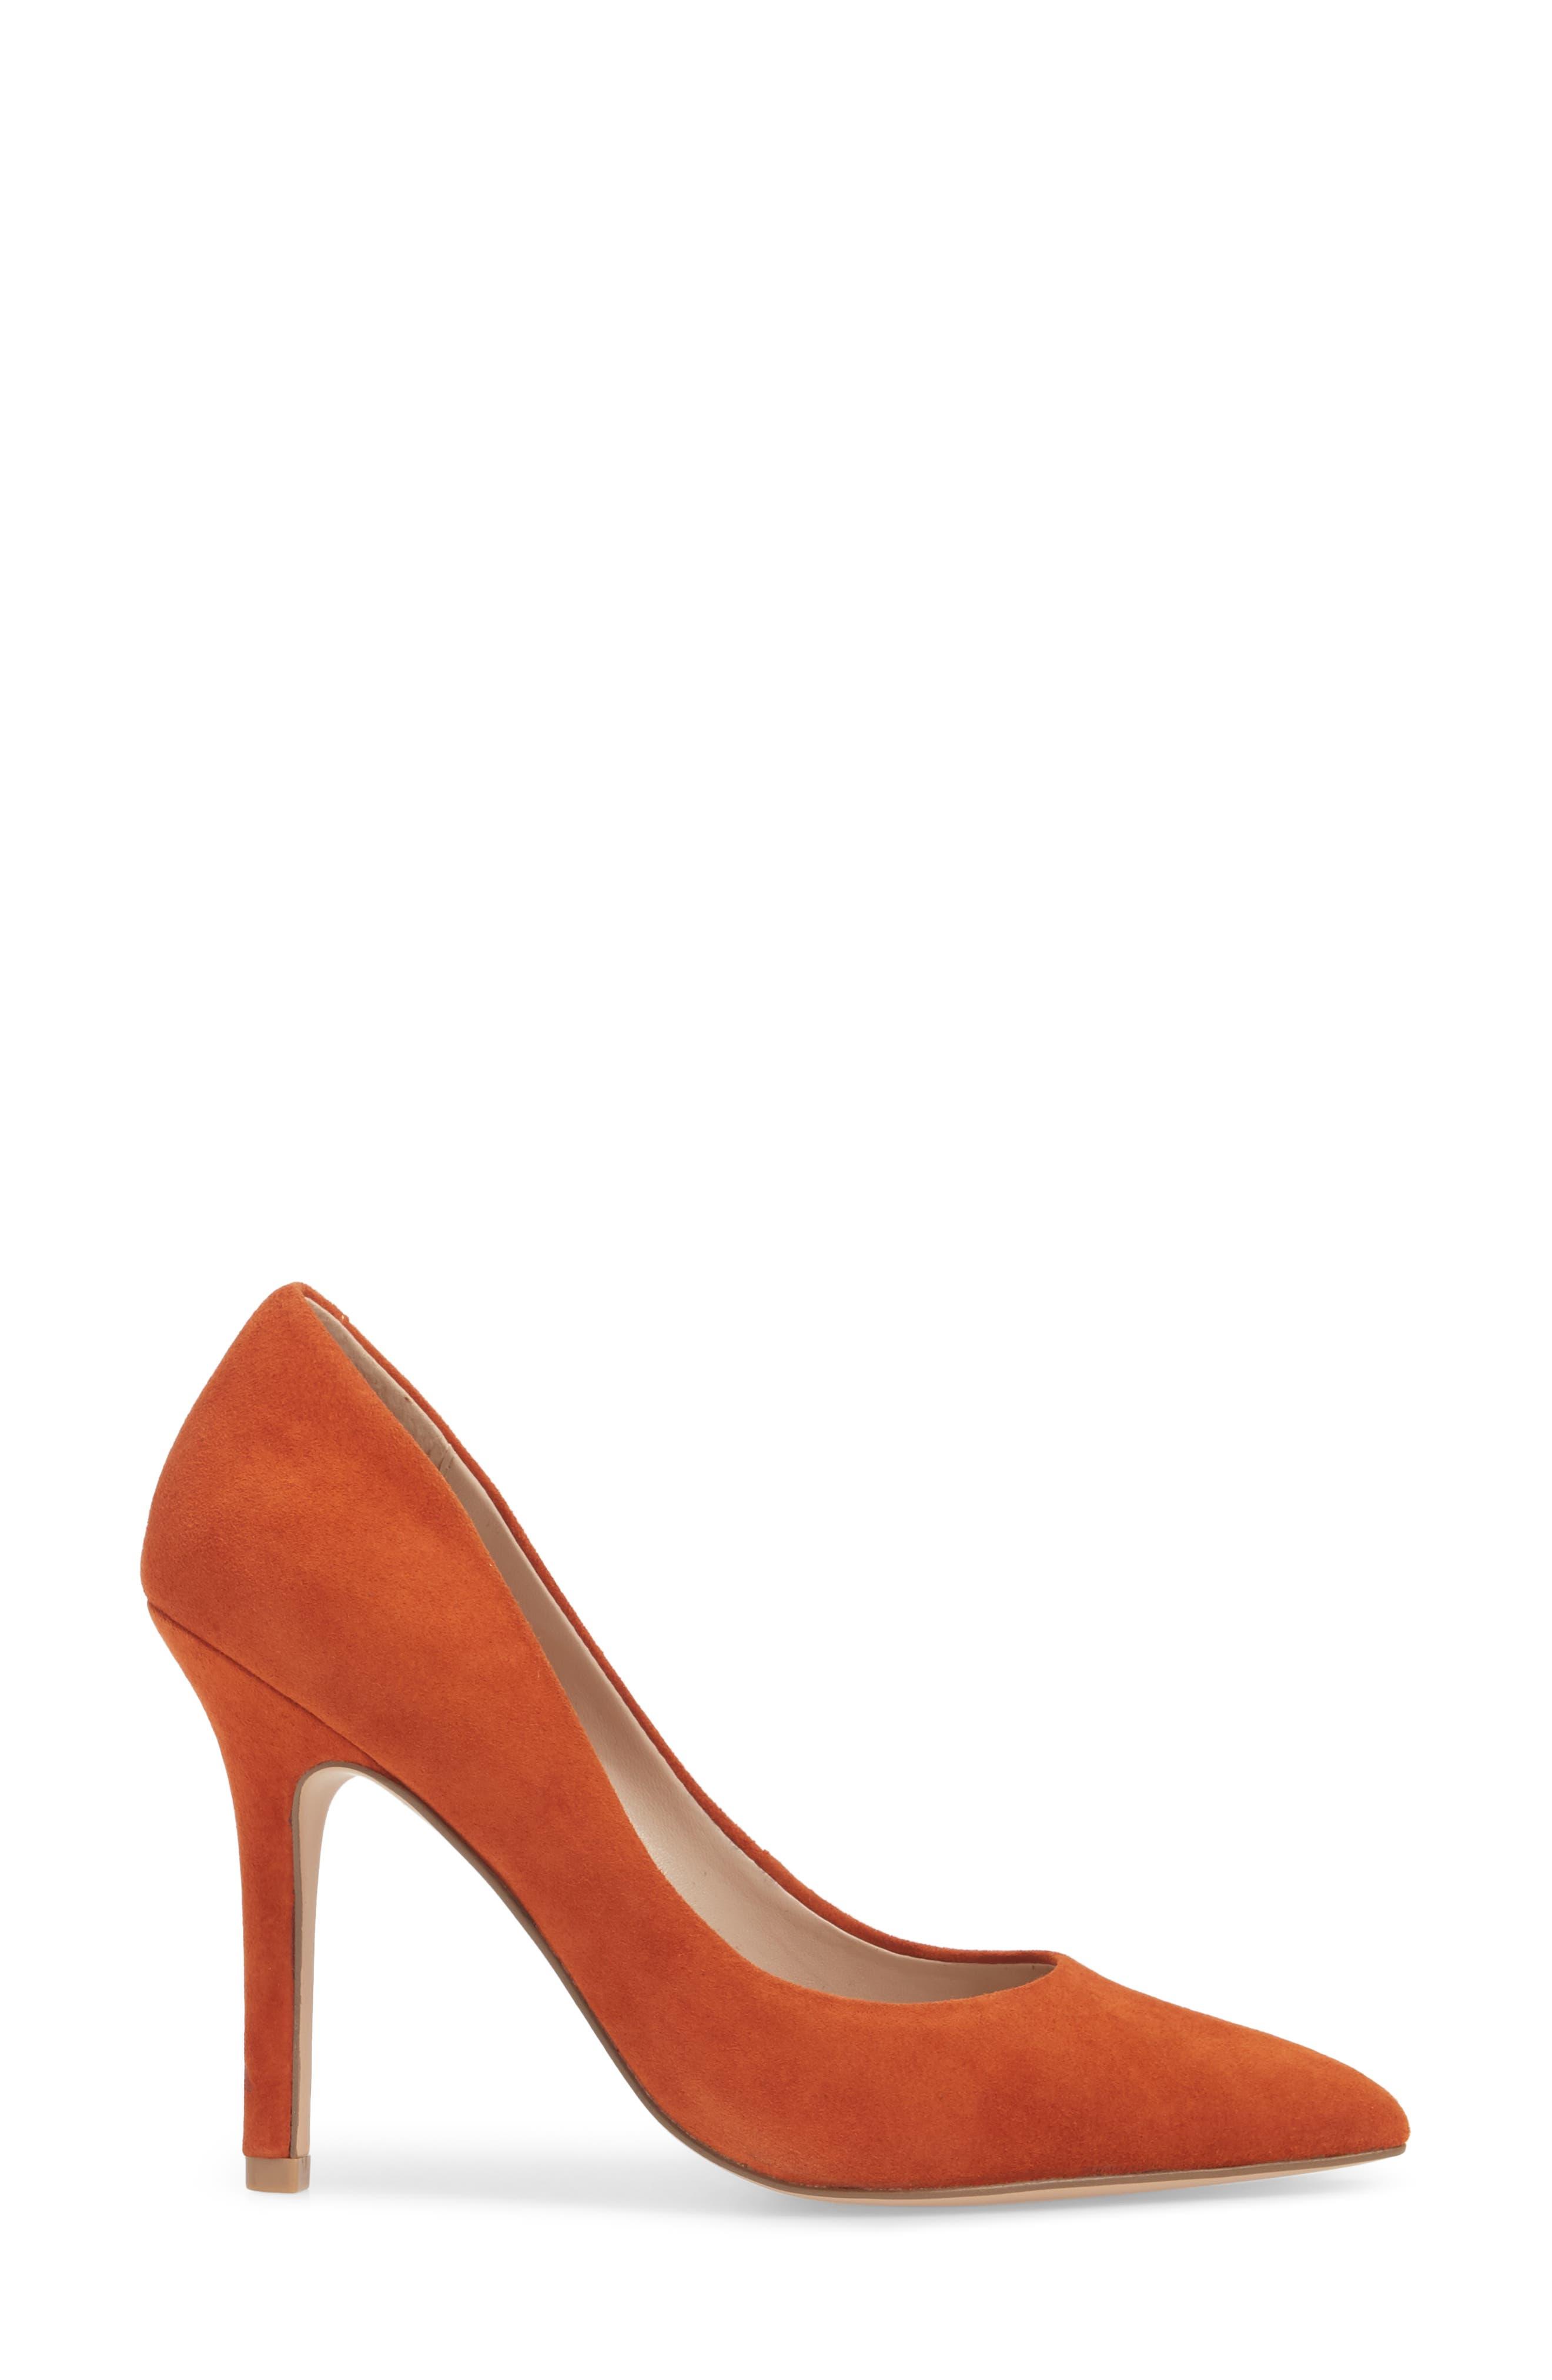 Maxx Pointy Toe Pump,                             Alternate thumbnail 3, color,                             Orange Suede